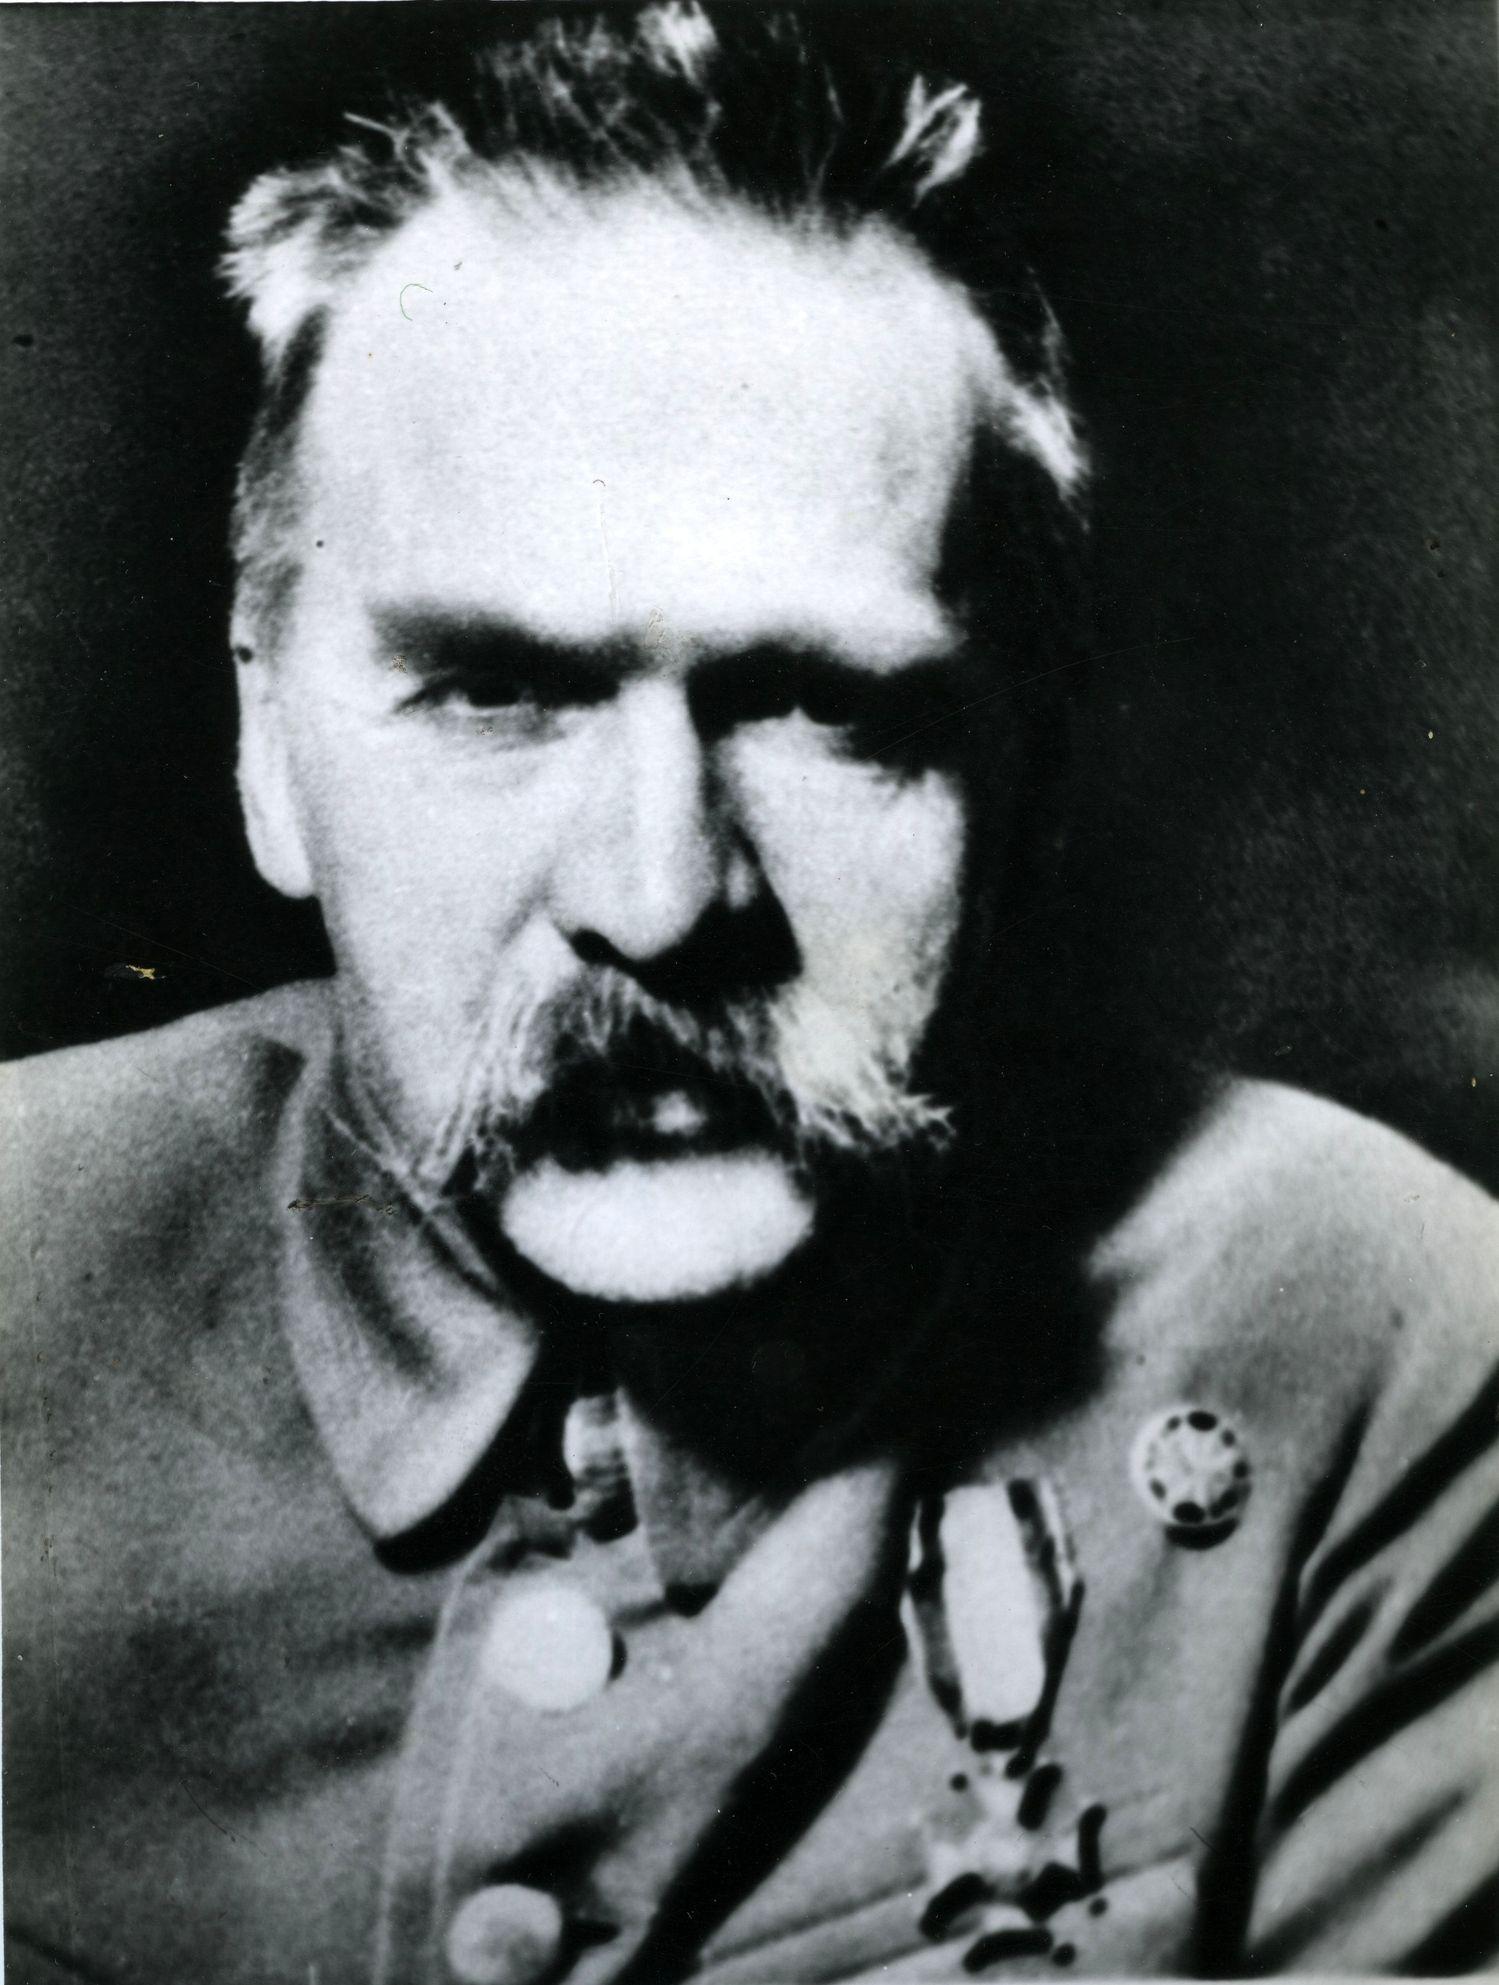 <div class='inner-box'><div class='close-desc'></div><span class='opis'>J&oacute;zef Piłsudski. 1929</span><div class='clearfix'></div><span>Sygn. FIL03162</span><div class='clearfix'></div><span>&copy; Instytut Literacki</span></div>